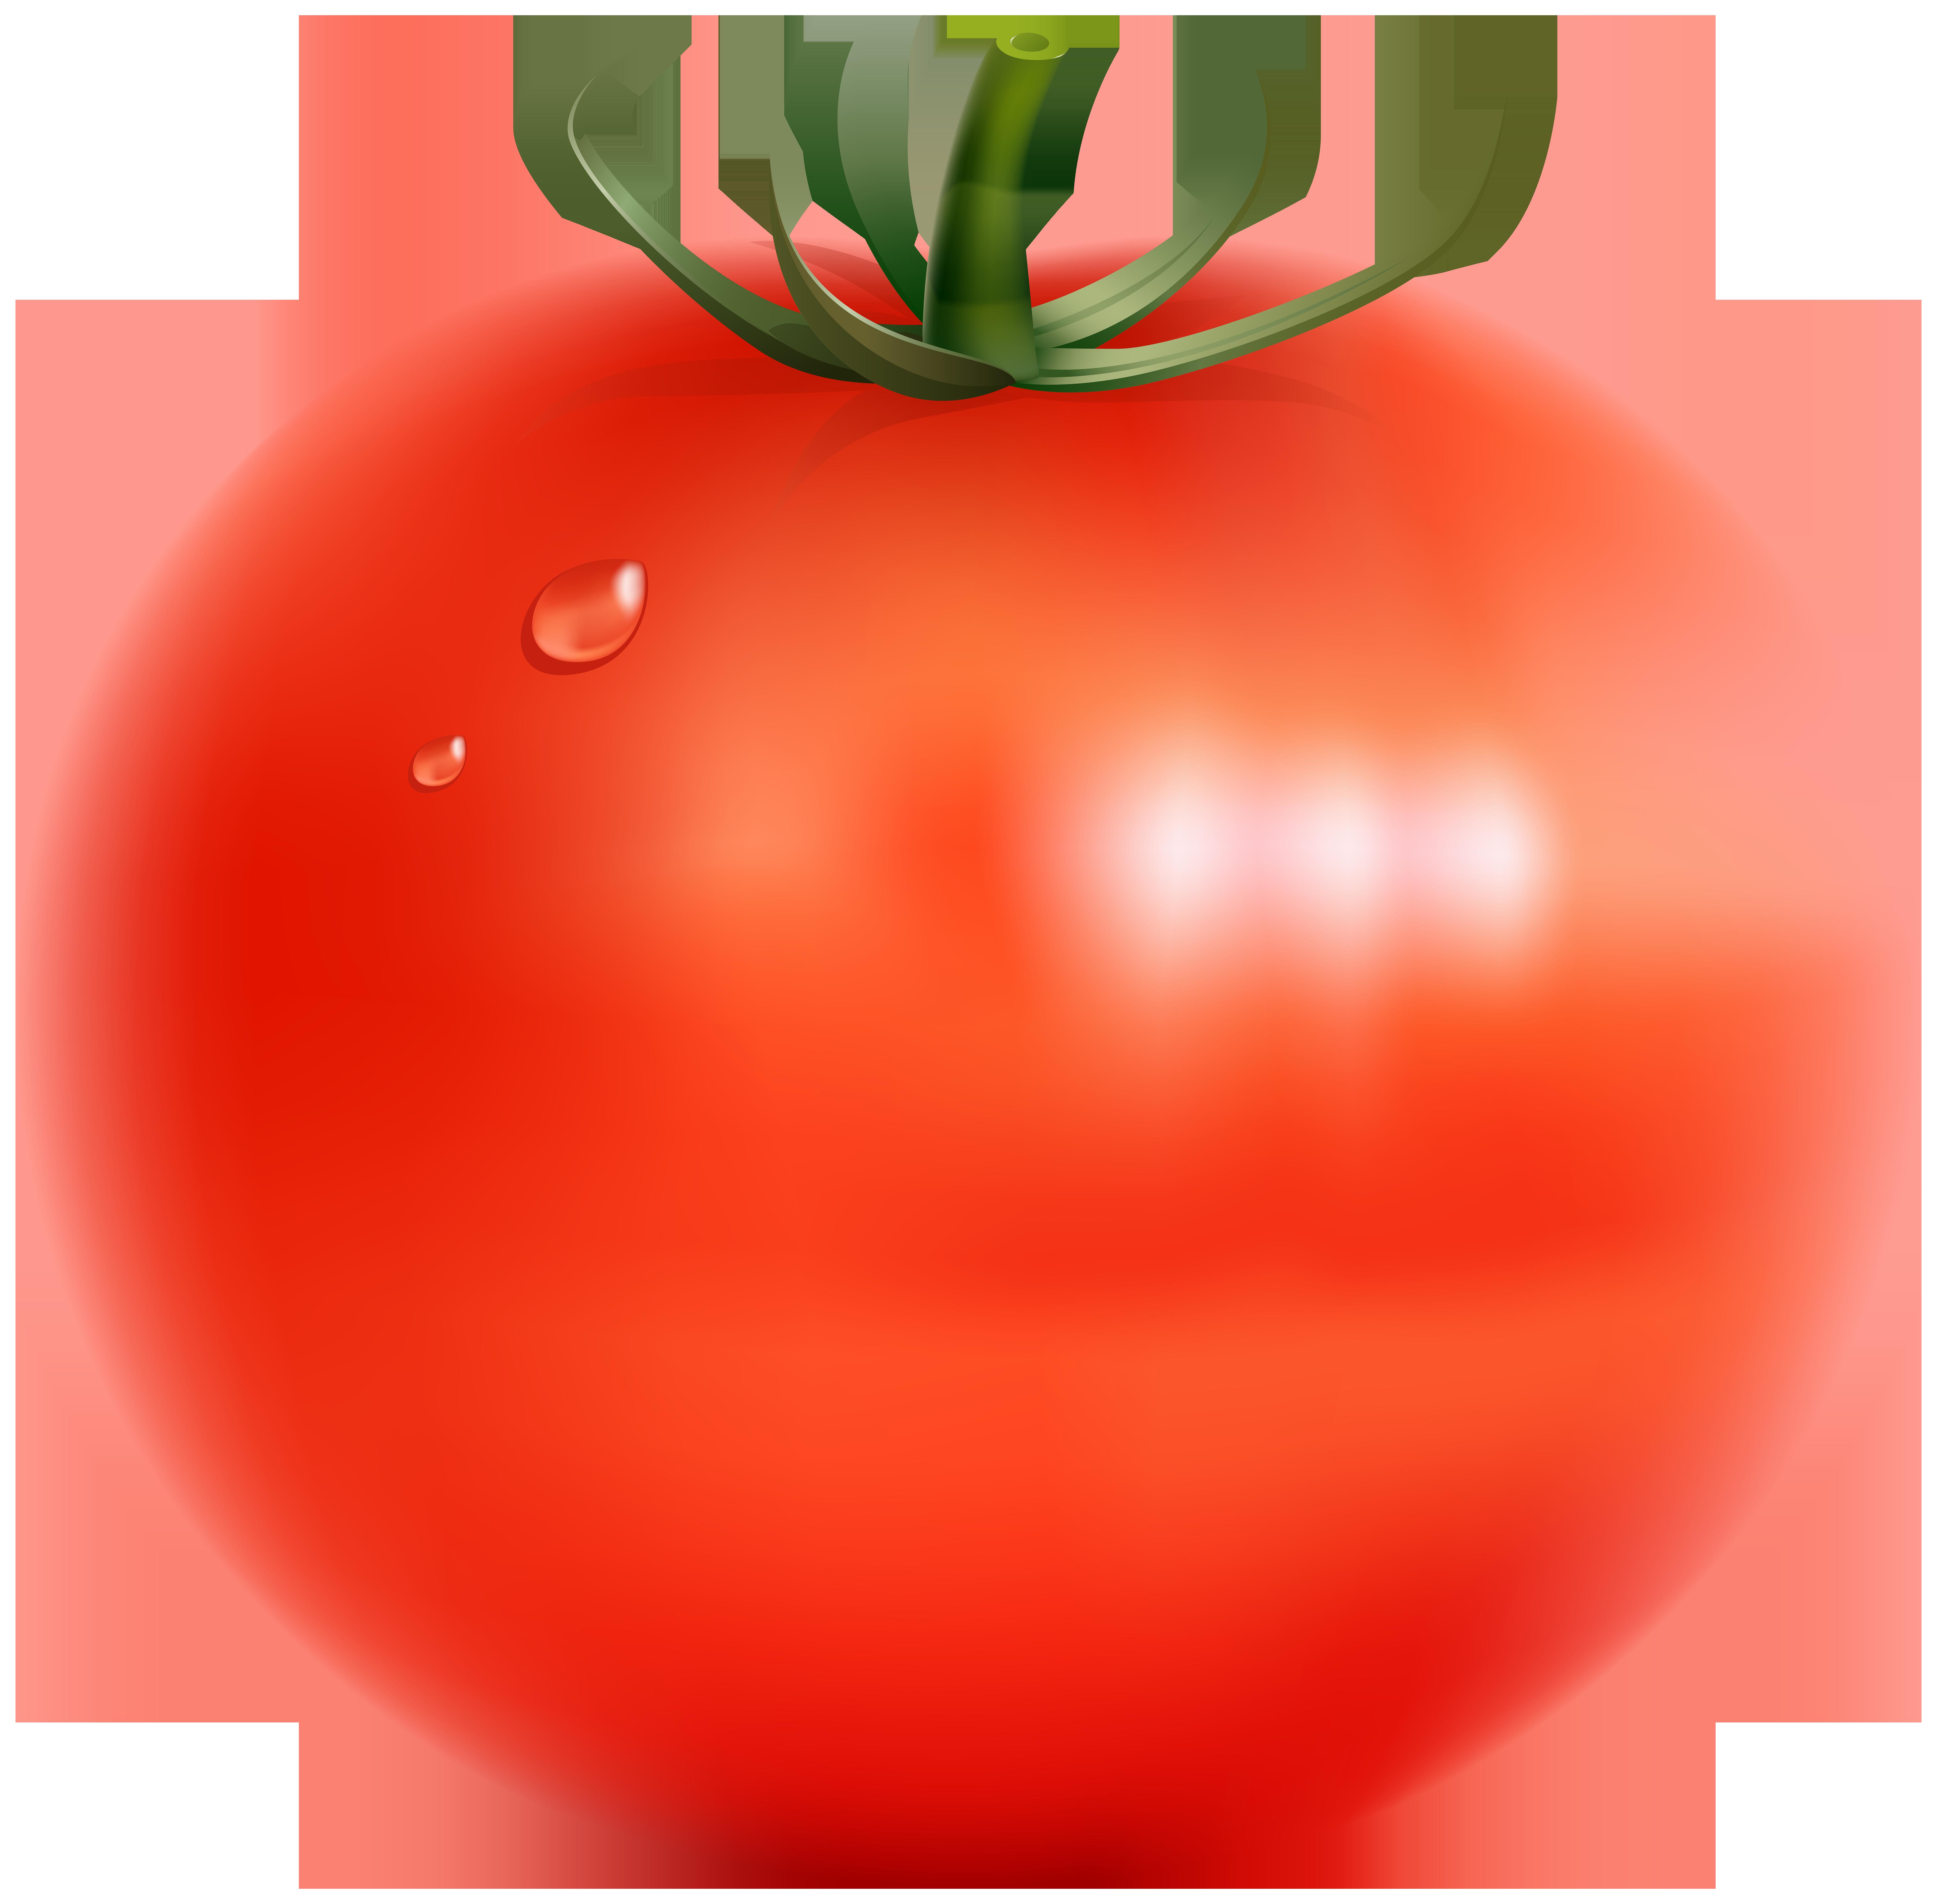 Tomato Transparent PNG Clip Art Image.